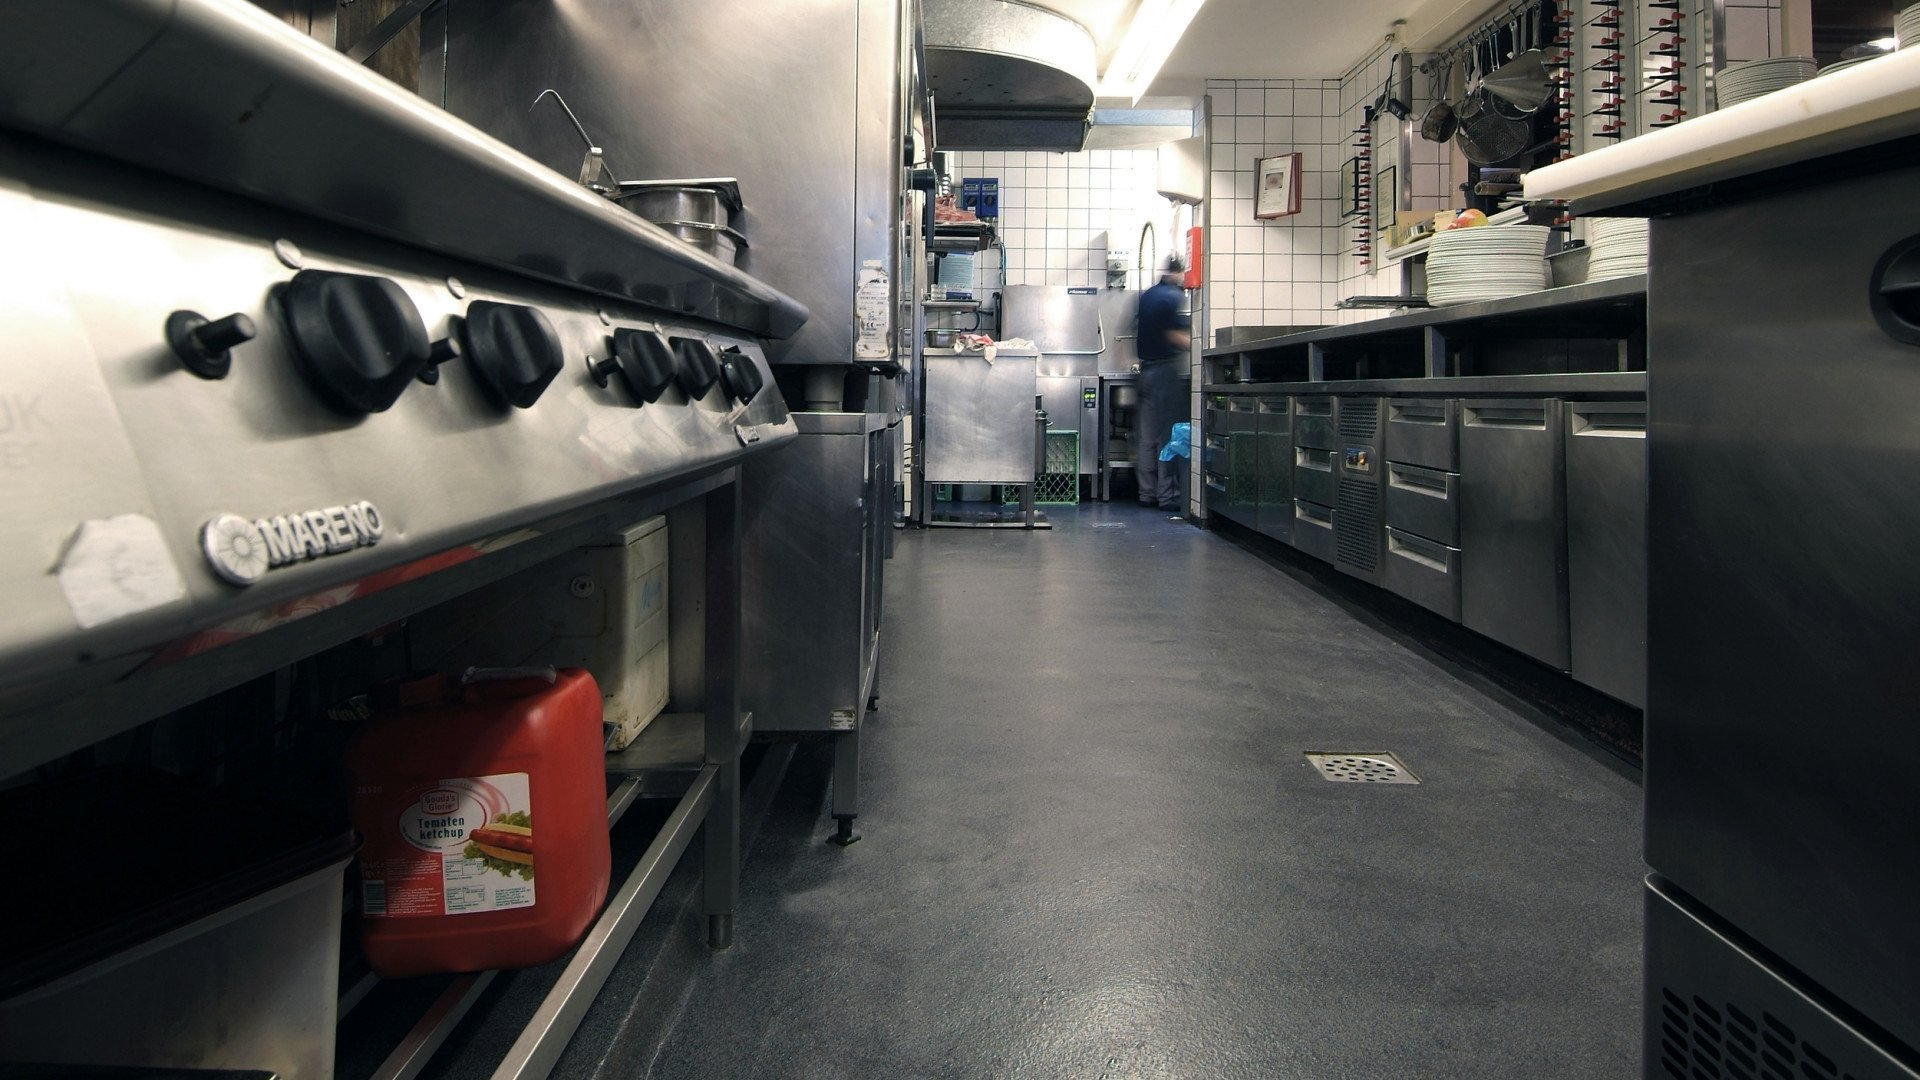 Restaurant Luden Amsterdam Bolidtop 510 MC